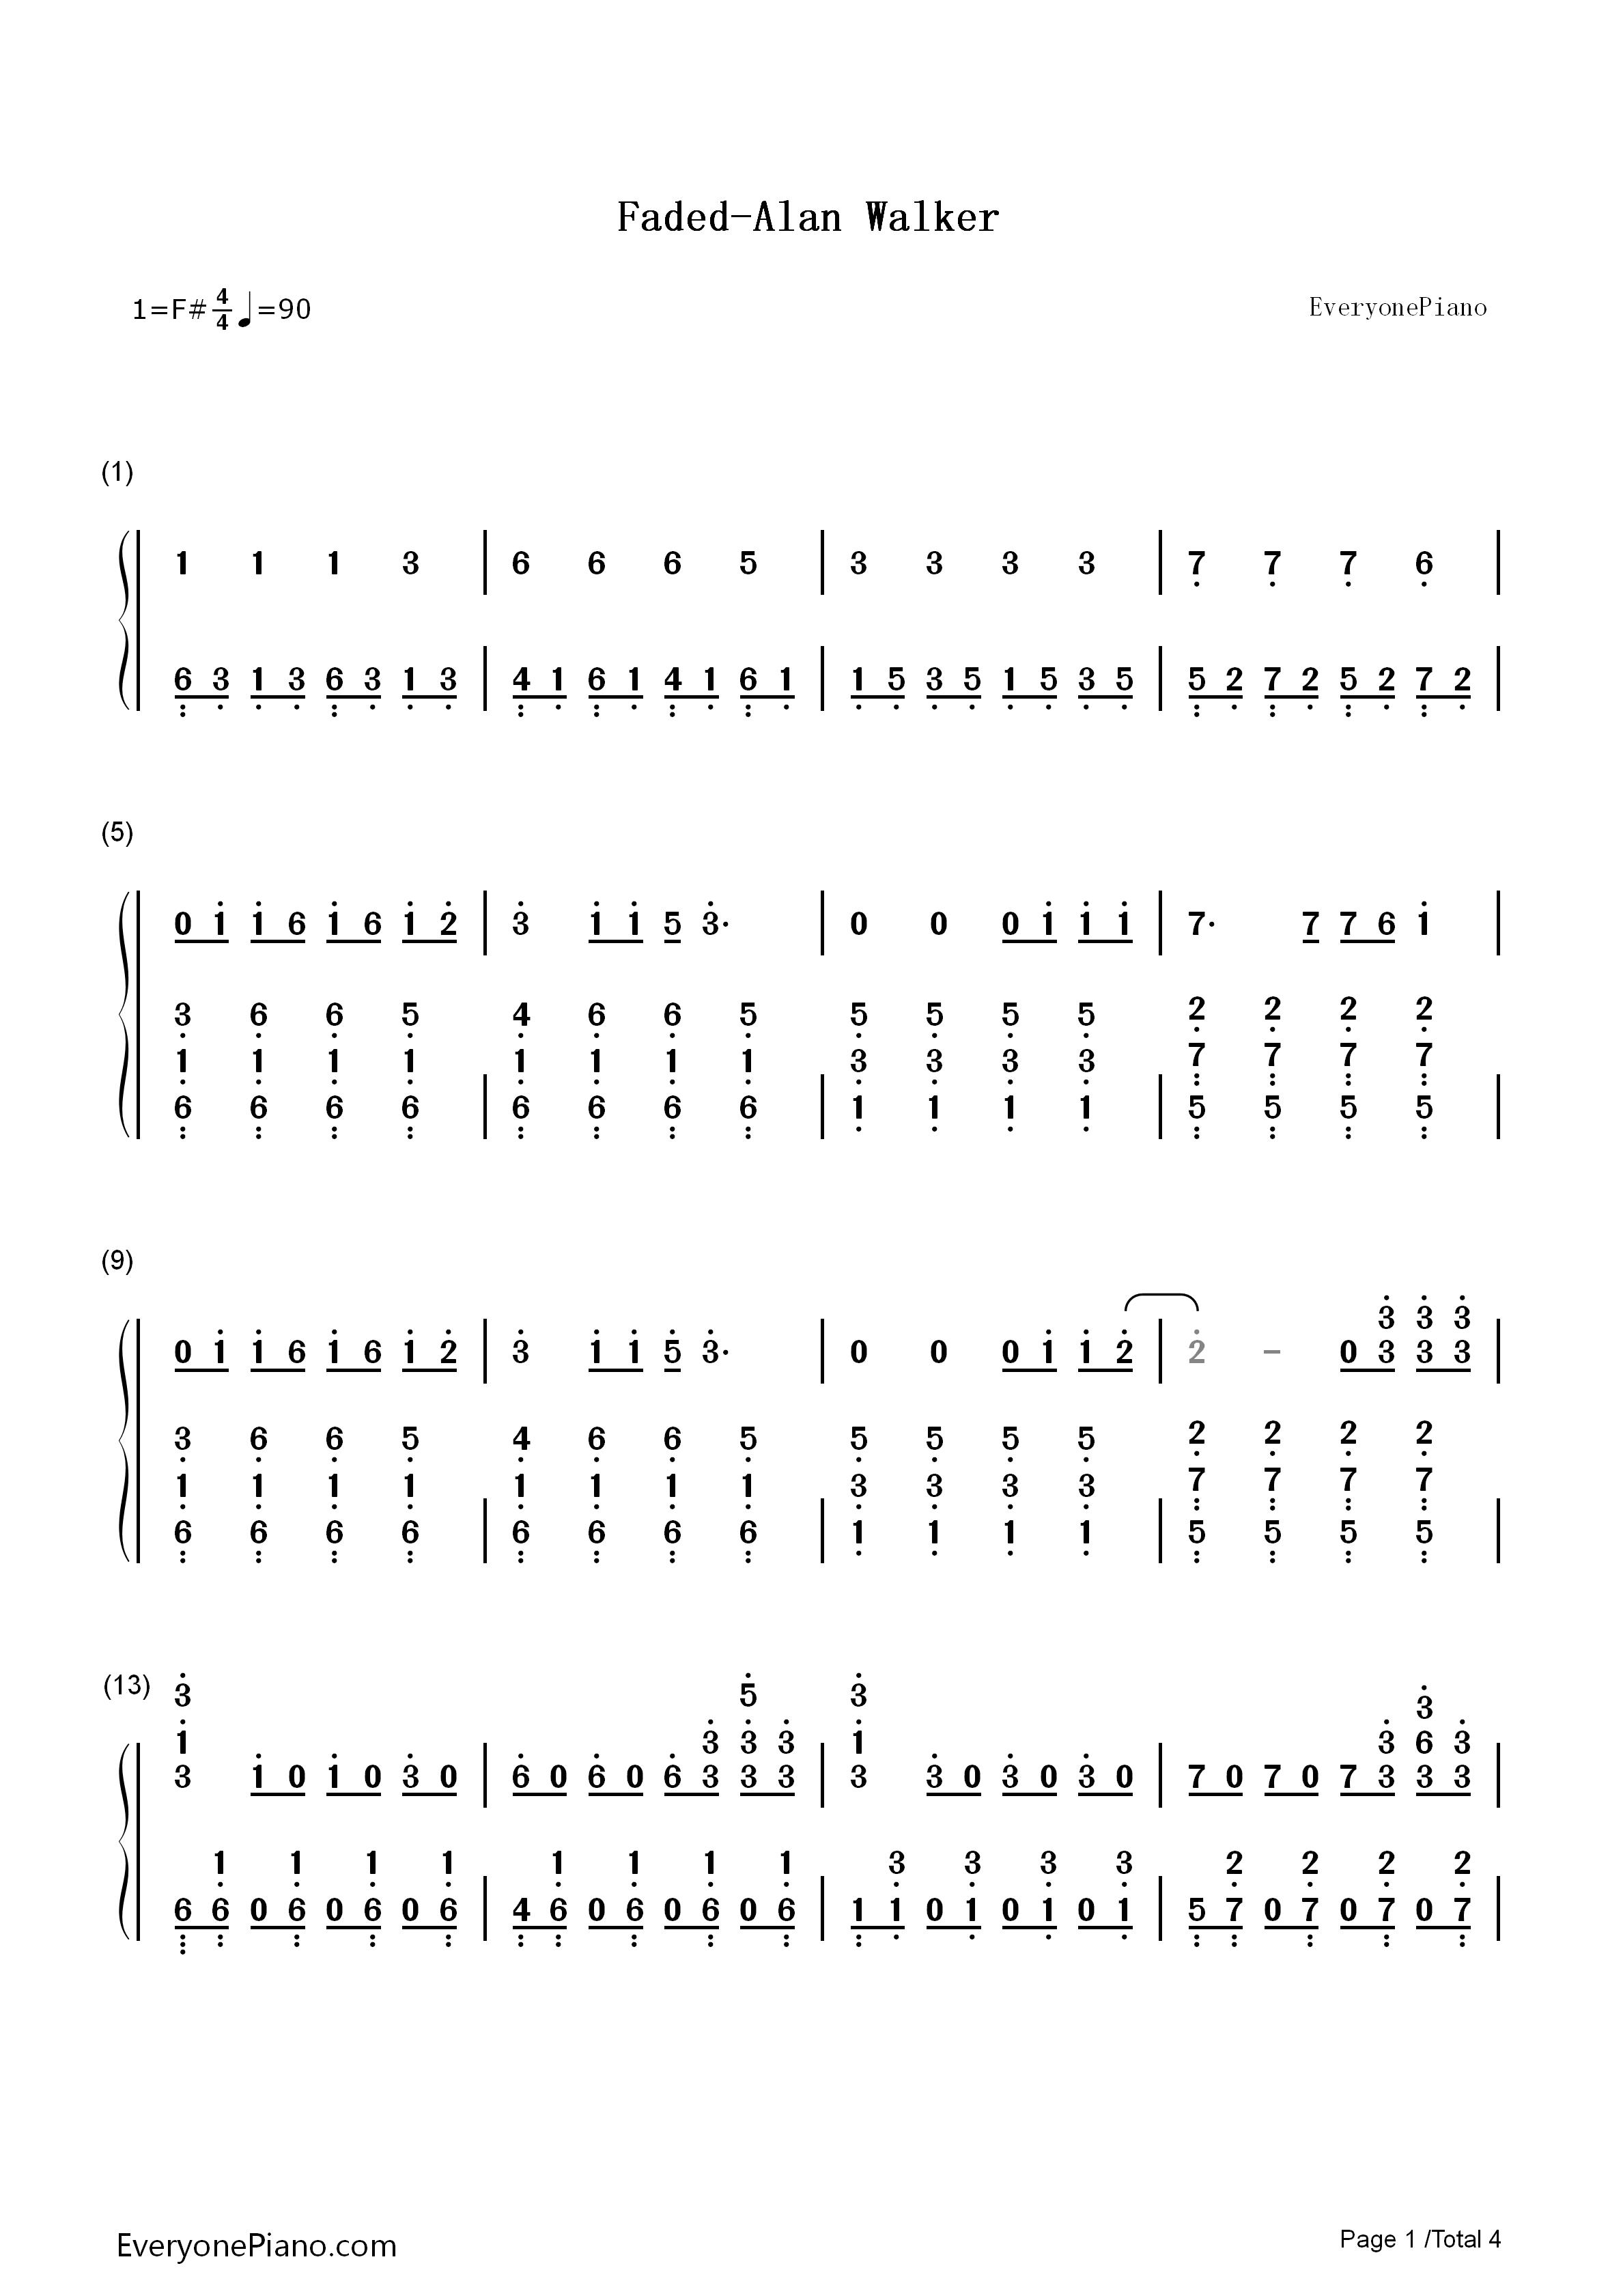 钢琴曲谱 流行 faded-alan walker faded-alan walker双手简谱预览1